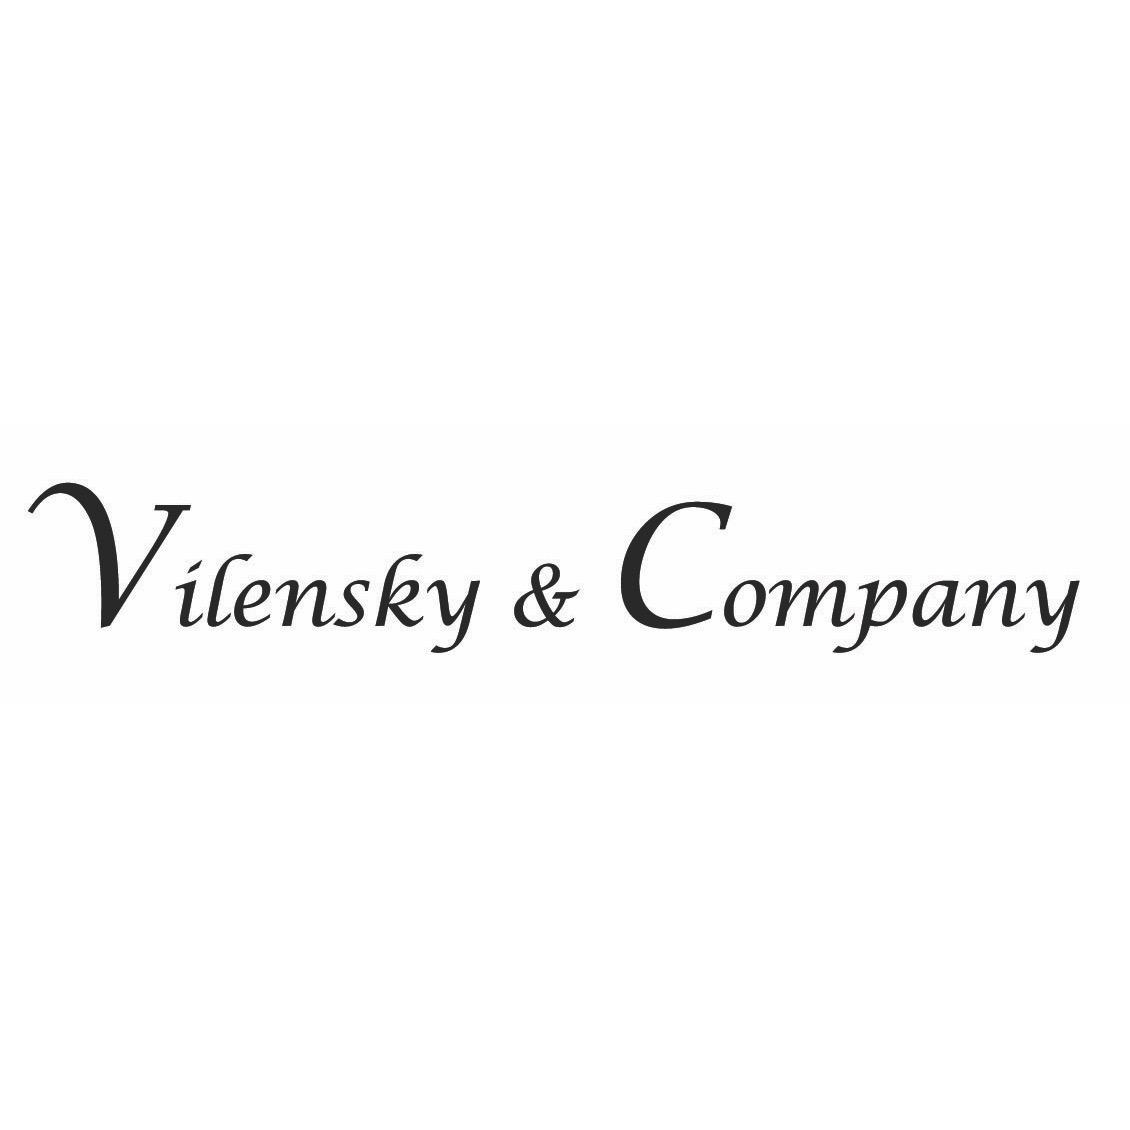 Vilensky and Company